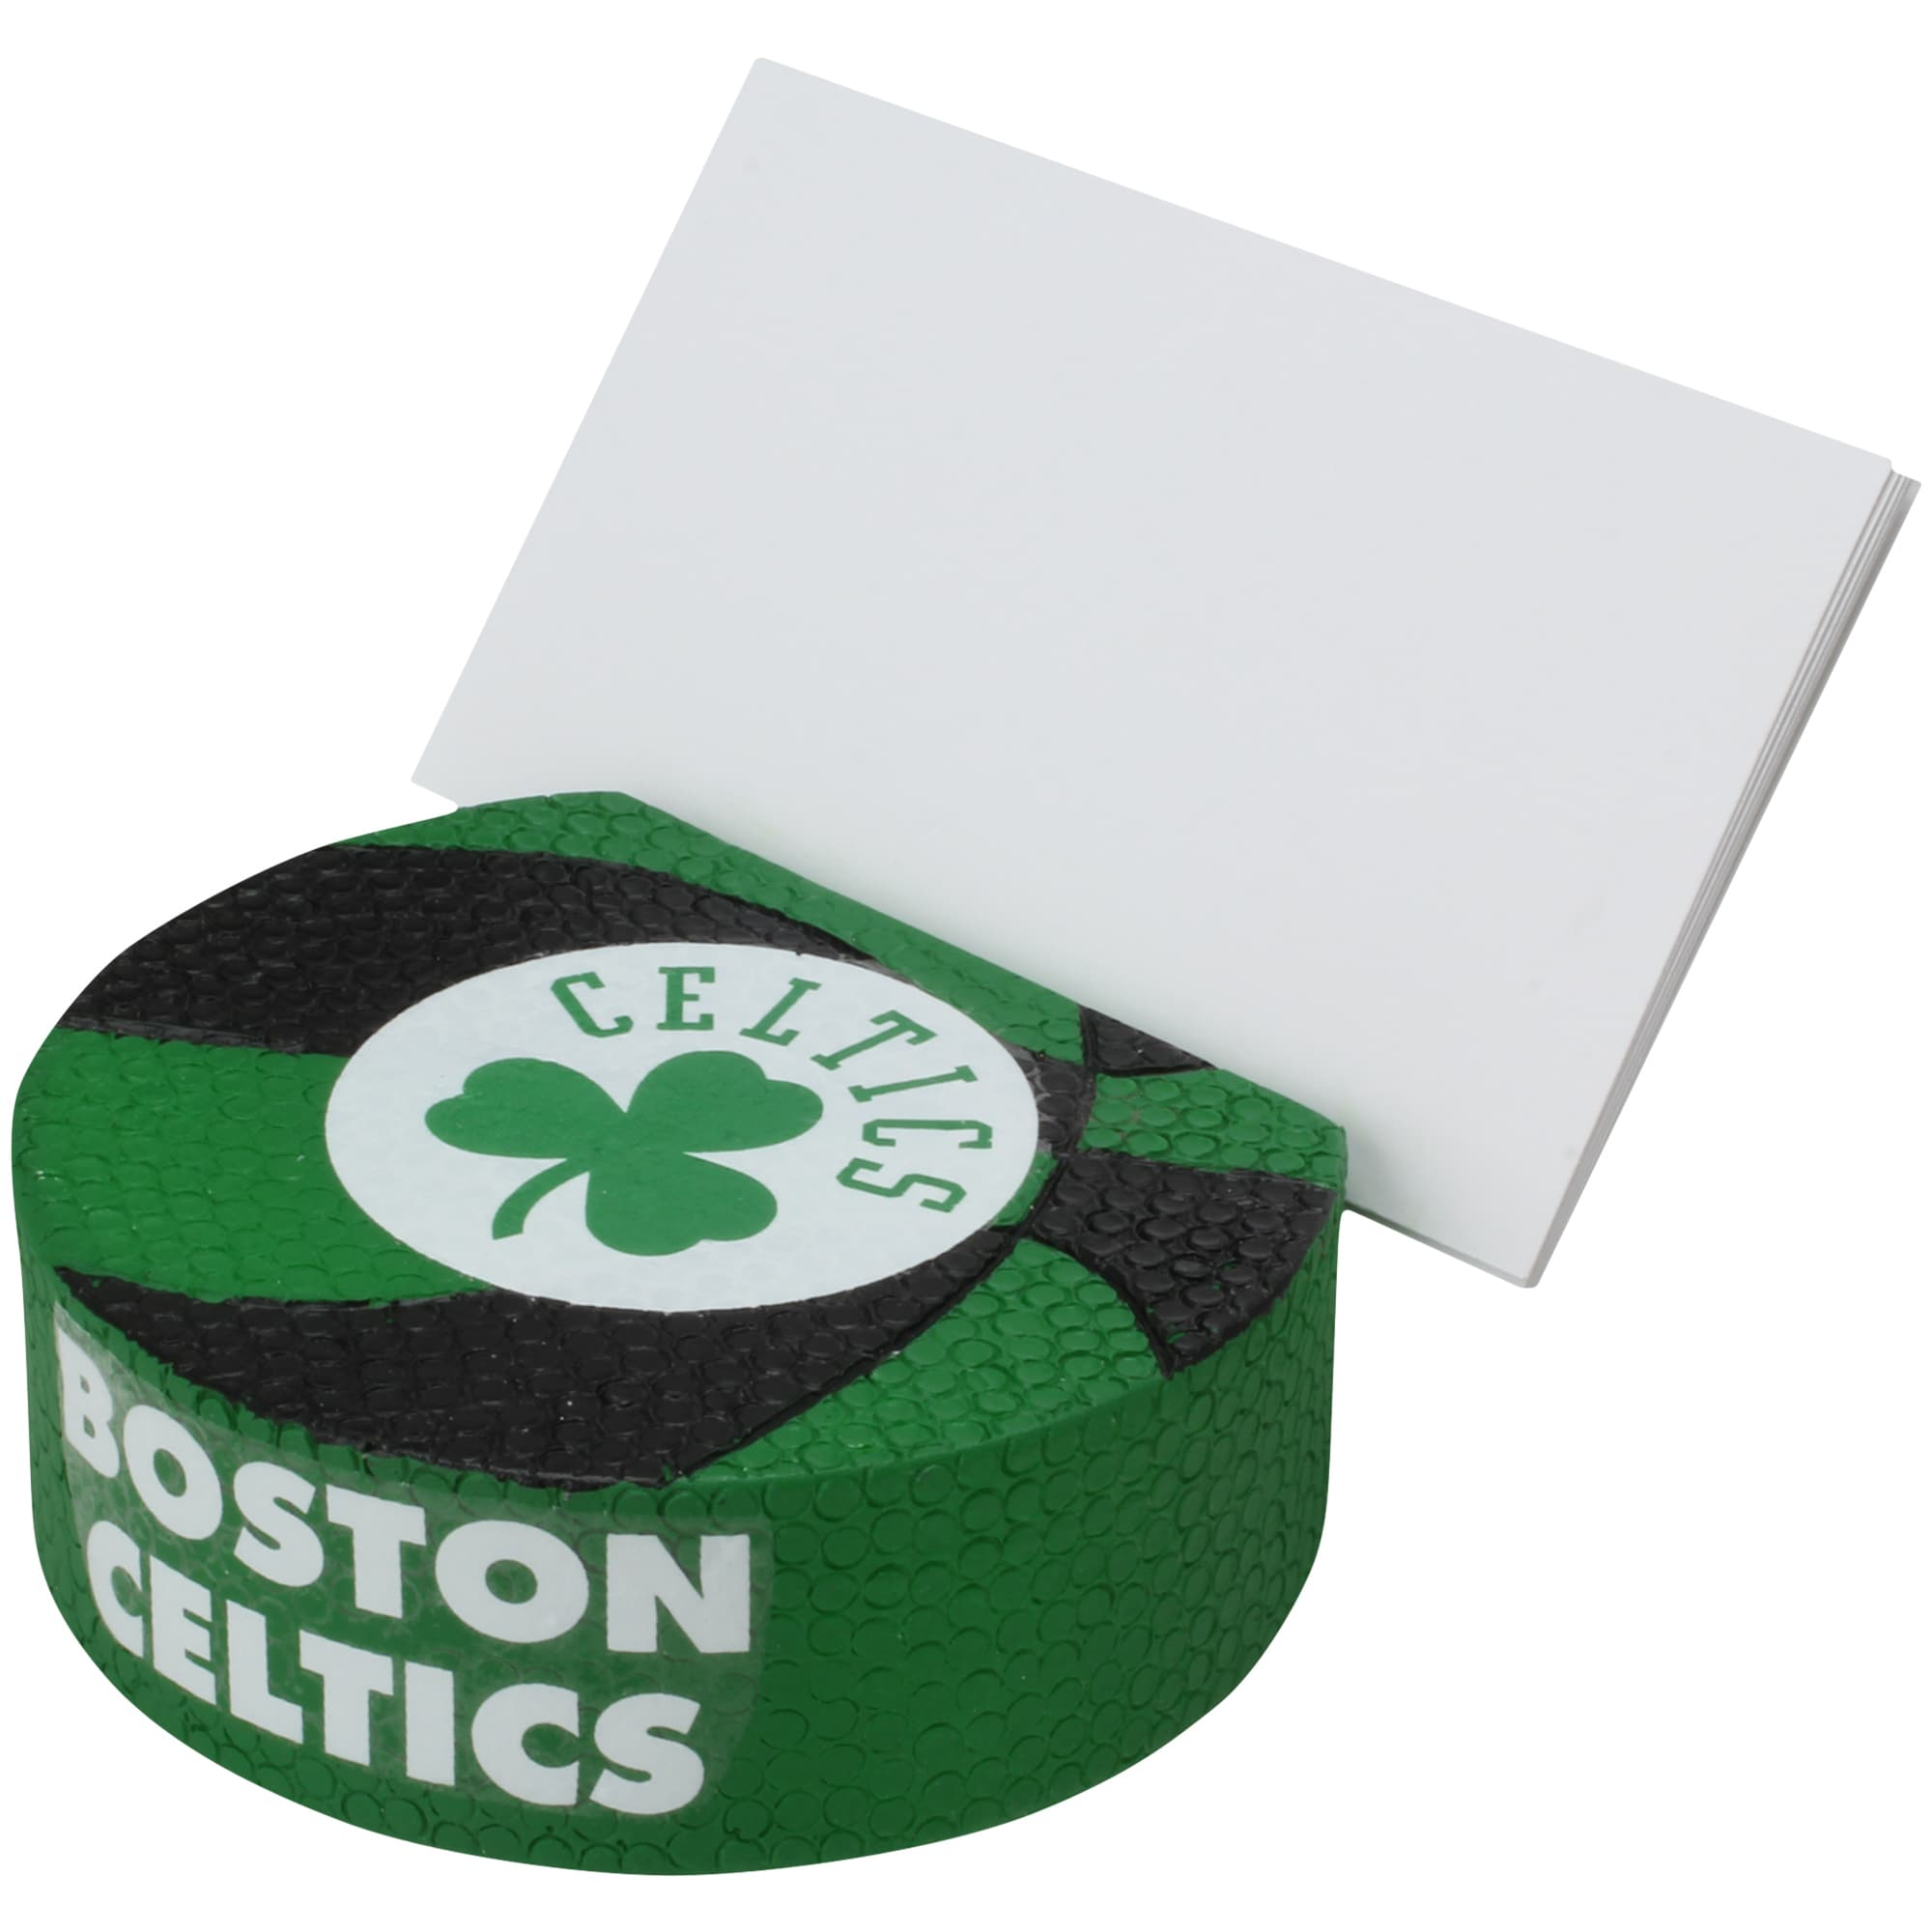 Boston Celtics Card Holder